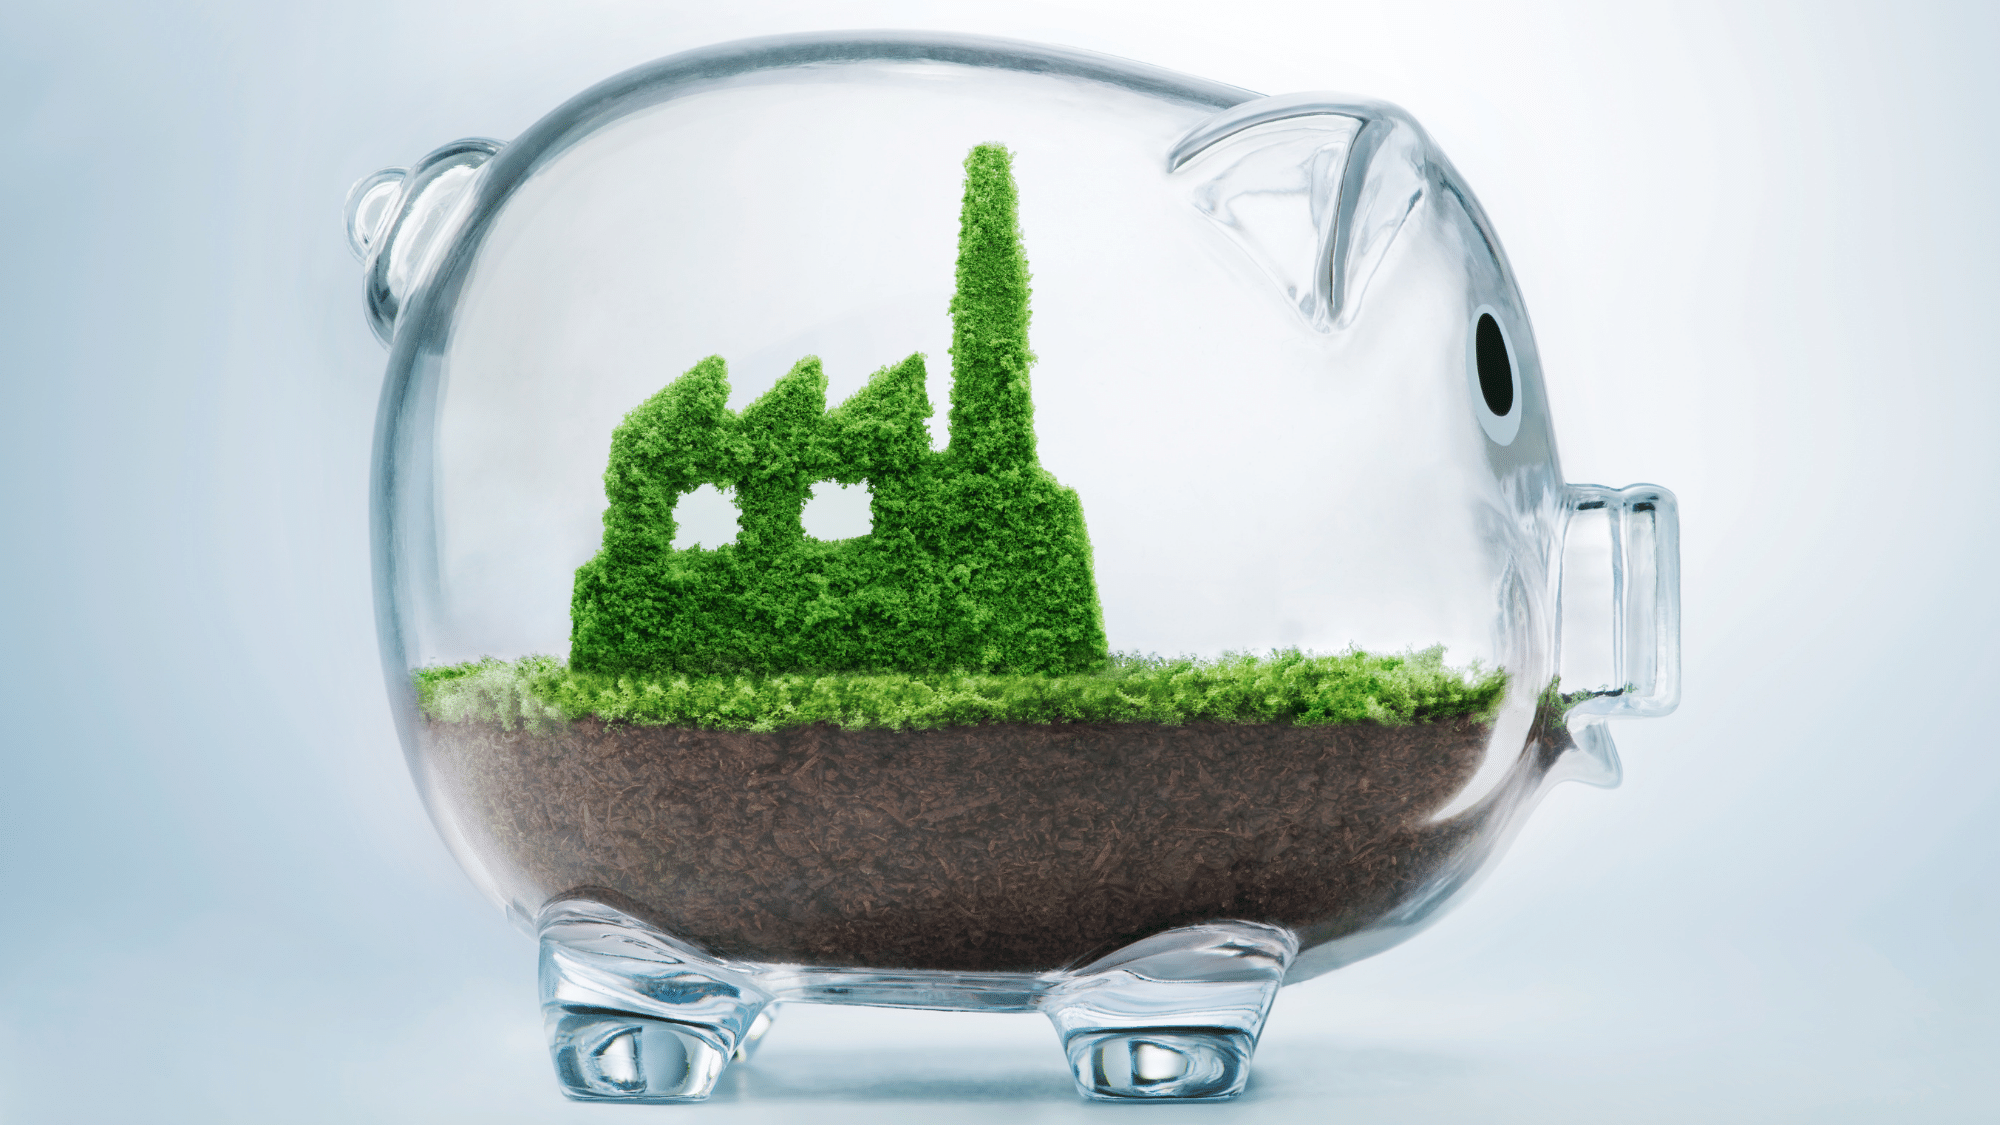 Beckon Capital: It's about profit through impact